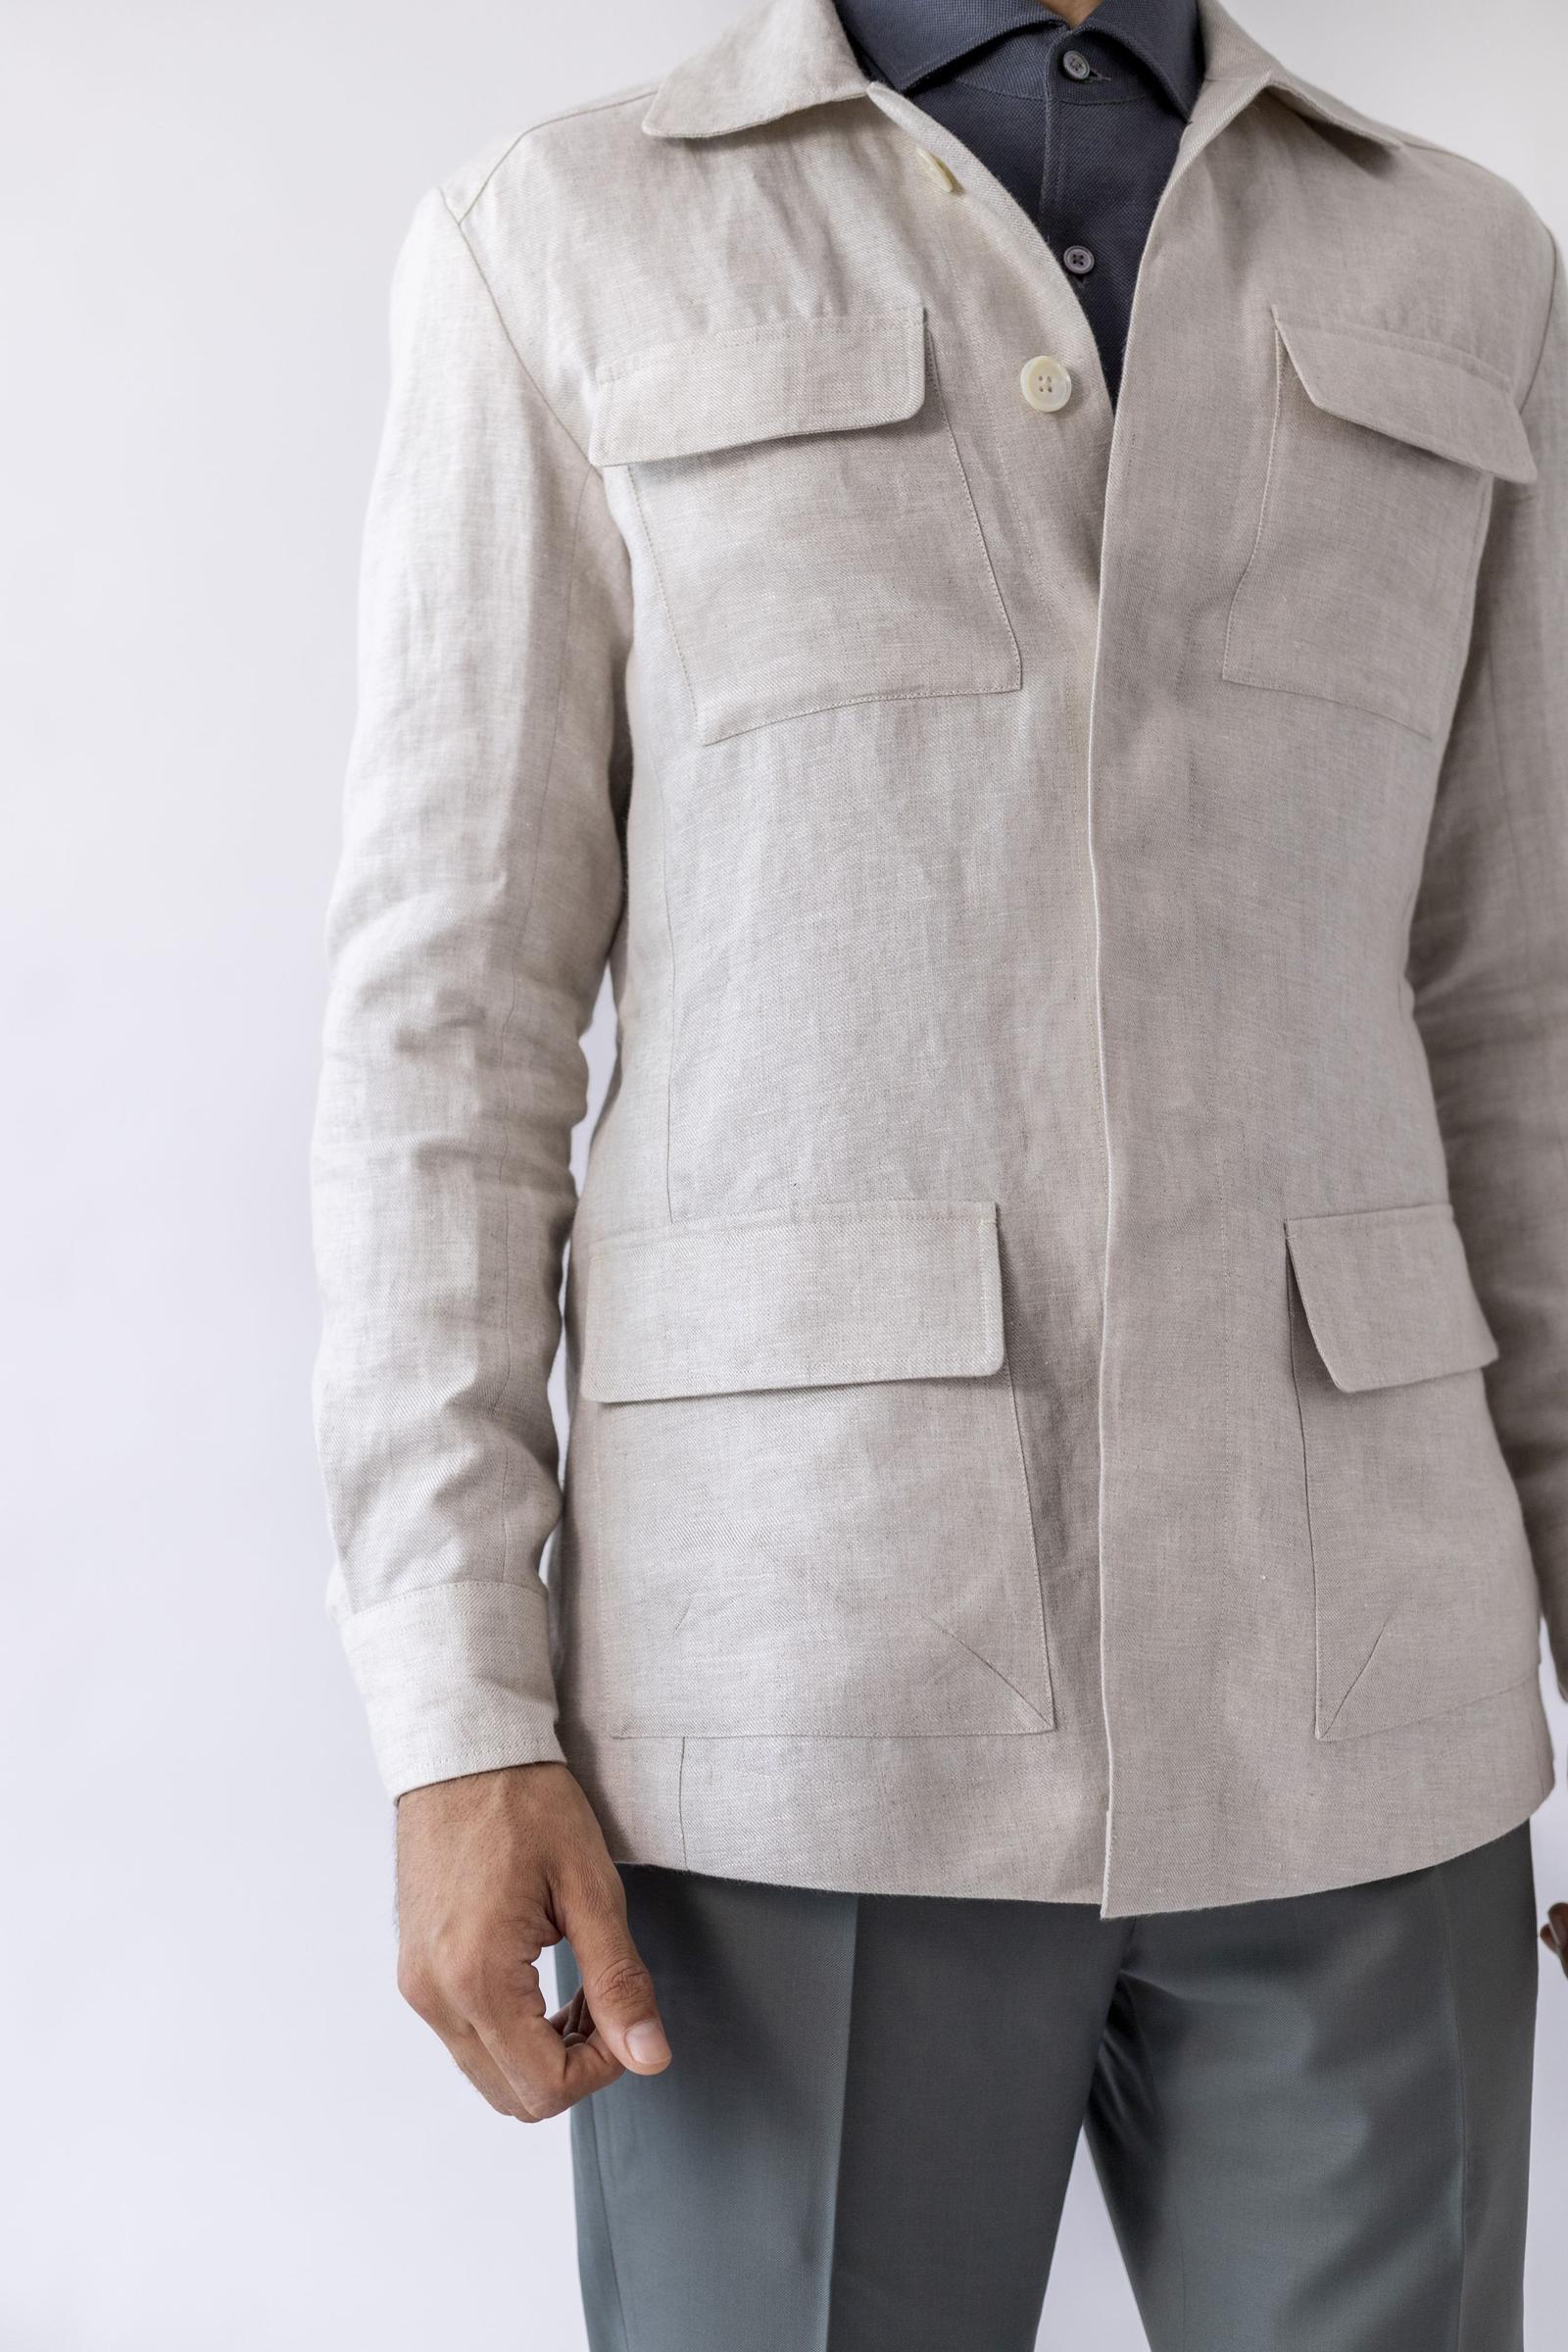 City Safari Jacket - Milk Linen